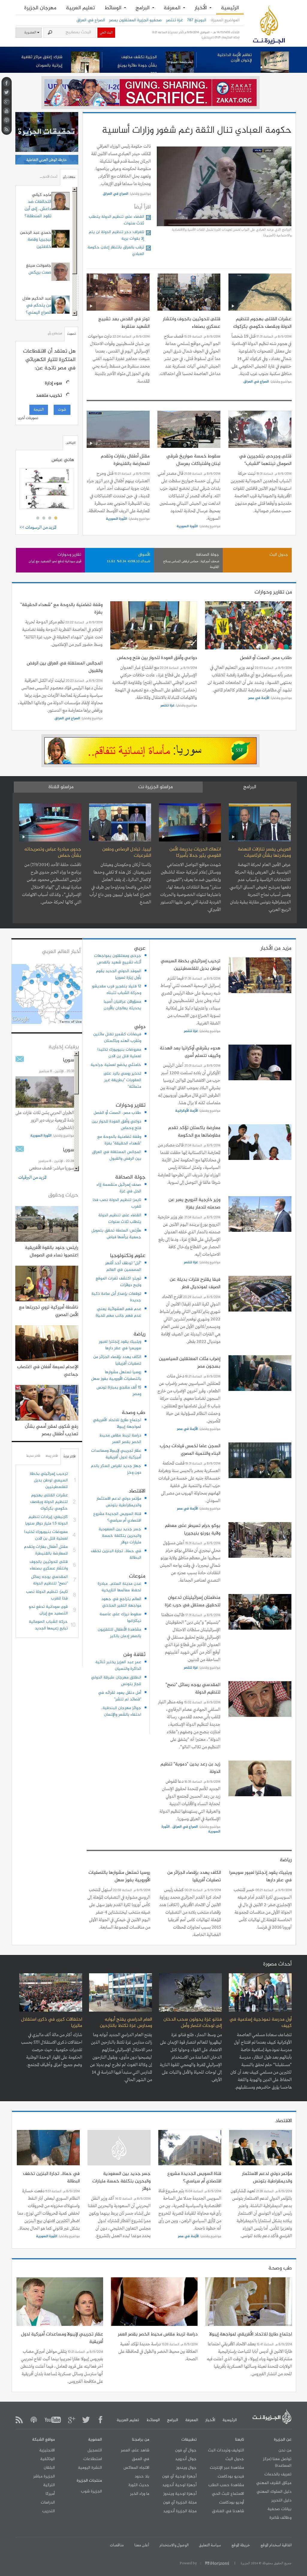 Al Jazeera at Monday Sept. 8, 2014, 10:10 p.m. UTC